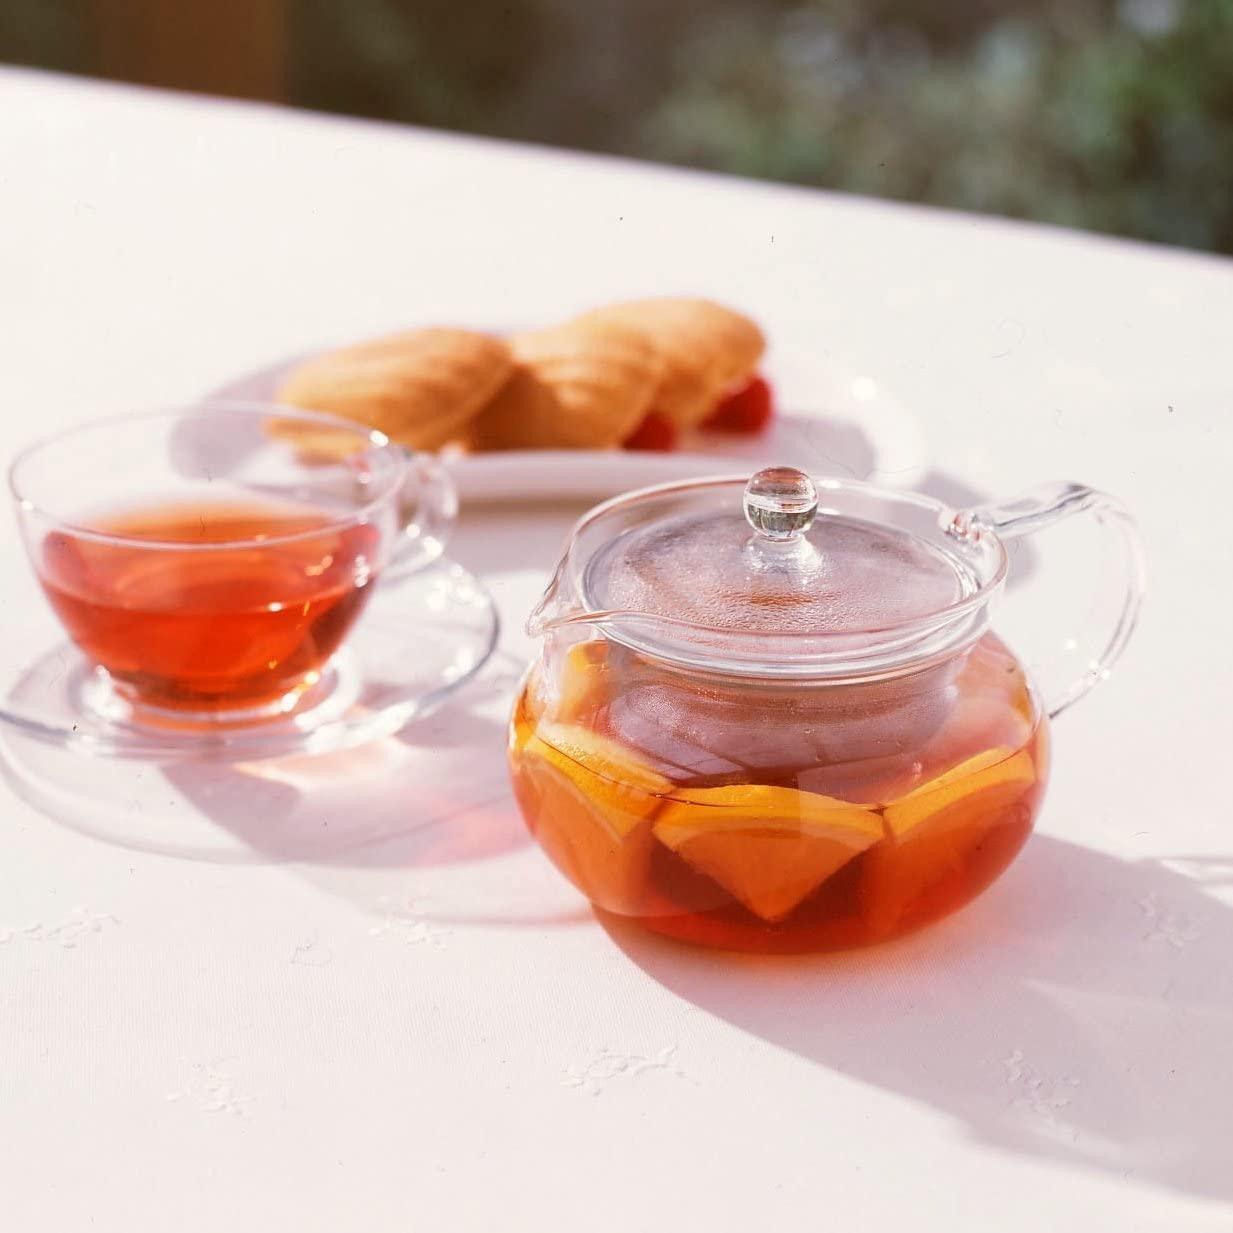 HARIO(ハリオ) 茶茶急須 丸 CHJMN-45T クリアの商品画像12